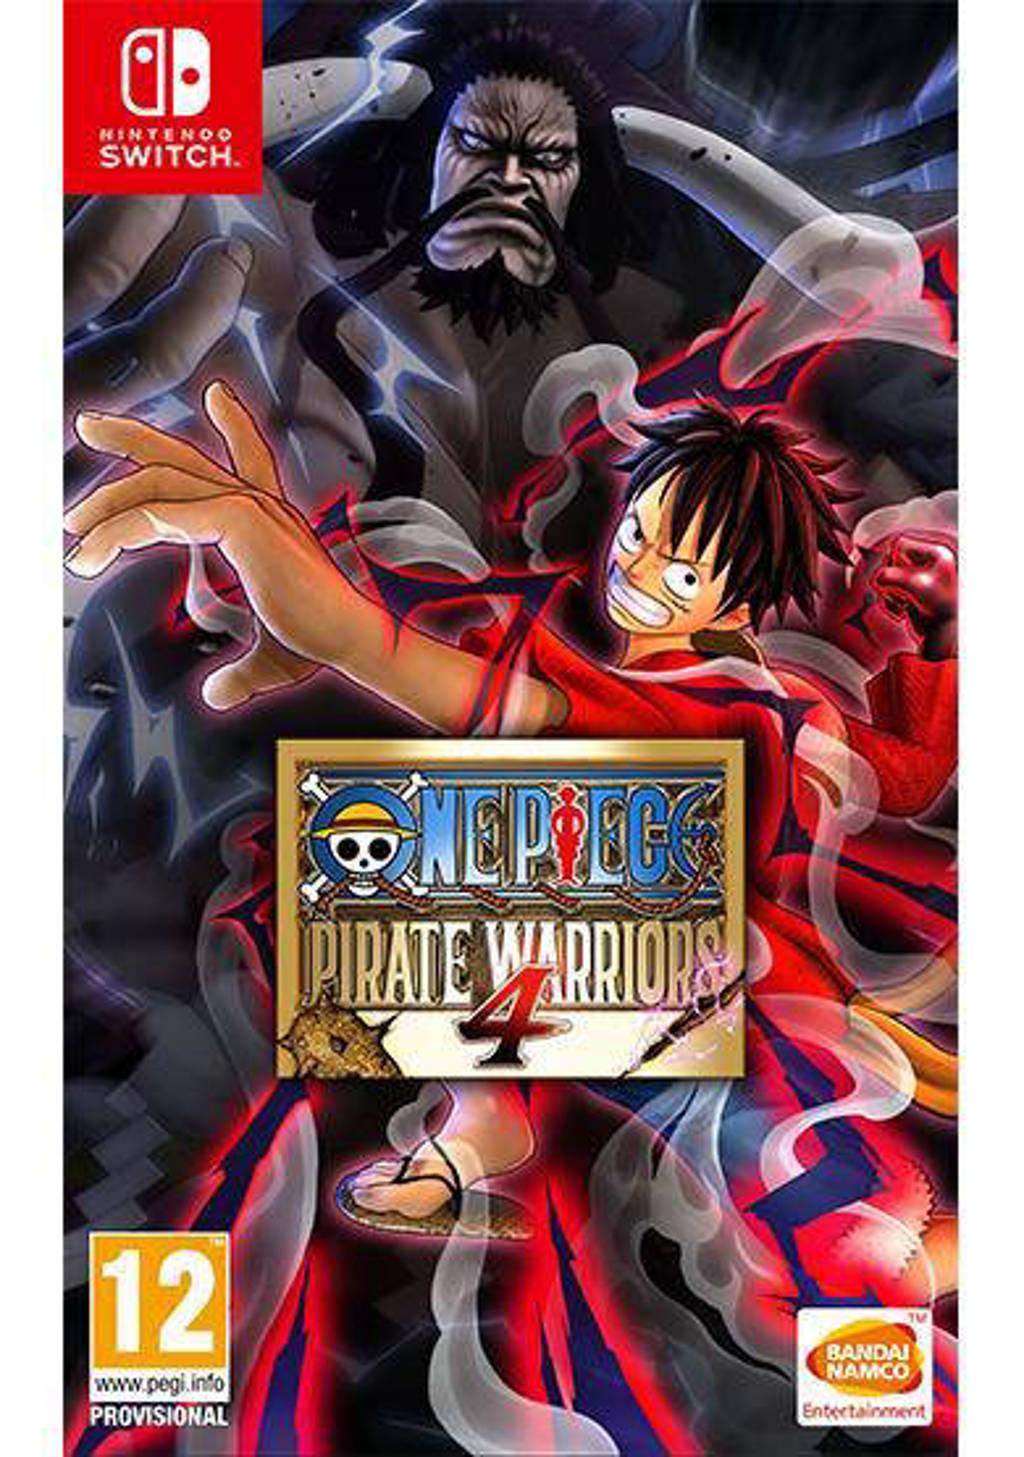 One piece - Pirate warriors 4 (Nintendo Switch)